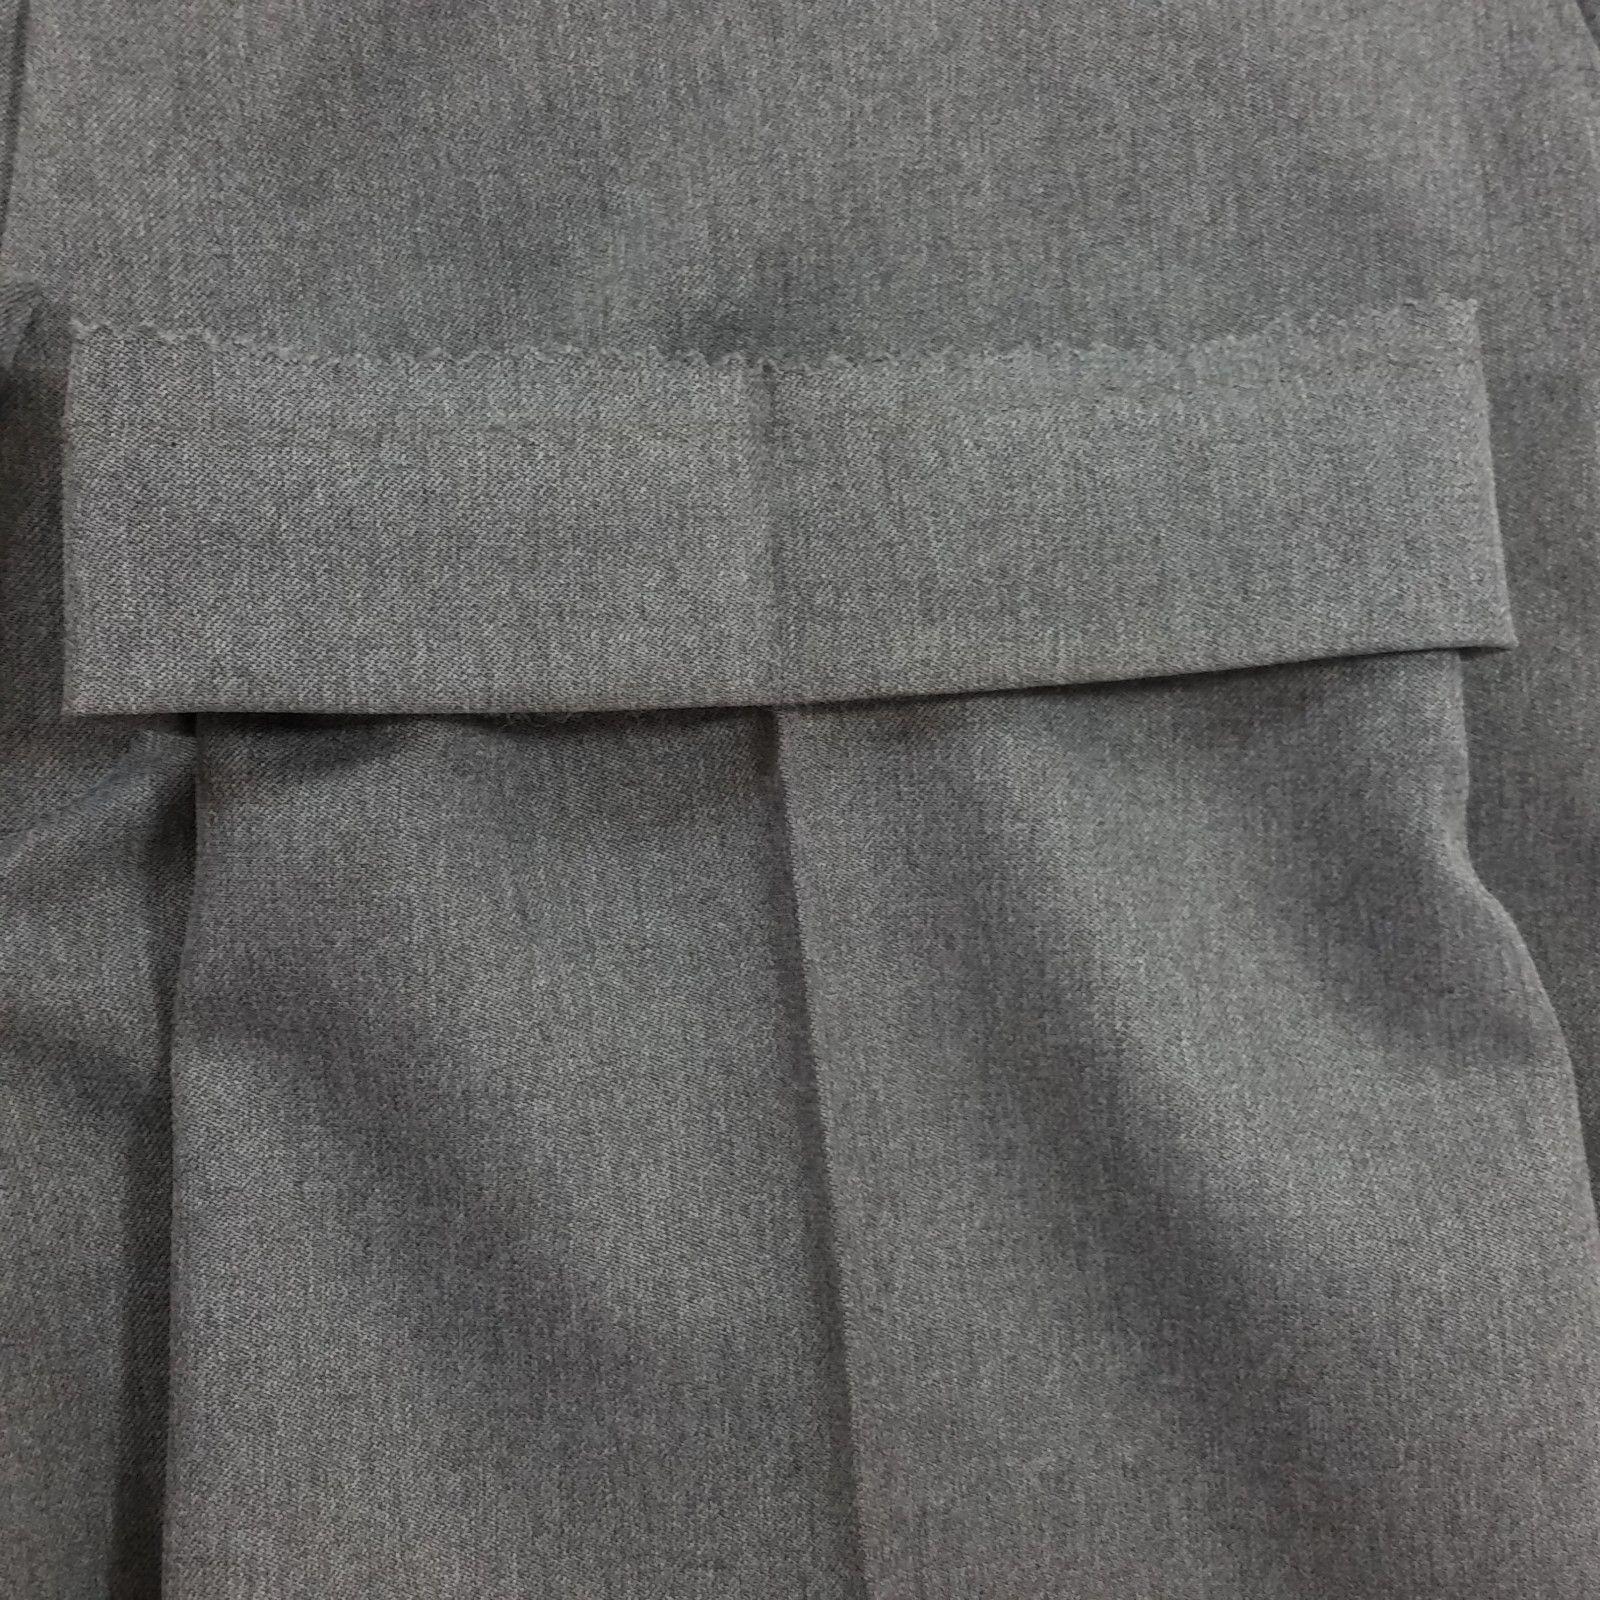 Levi's Action Slacks Sz 38 x 27 Gray Flat Front Vtg Vintage Charcoal #L2